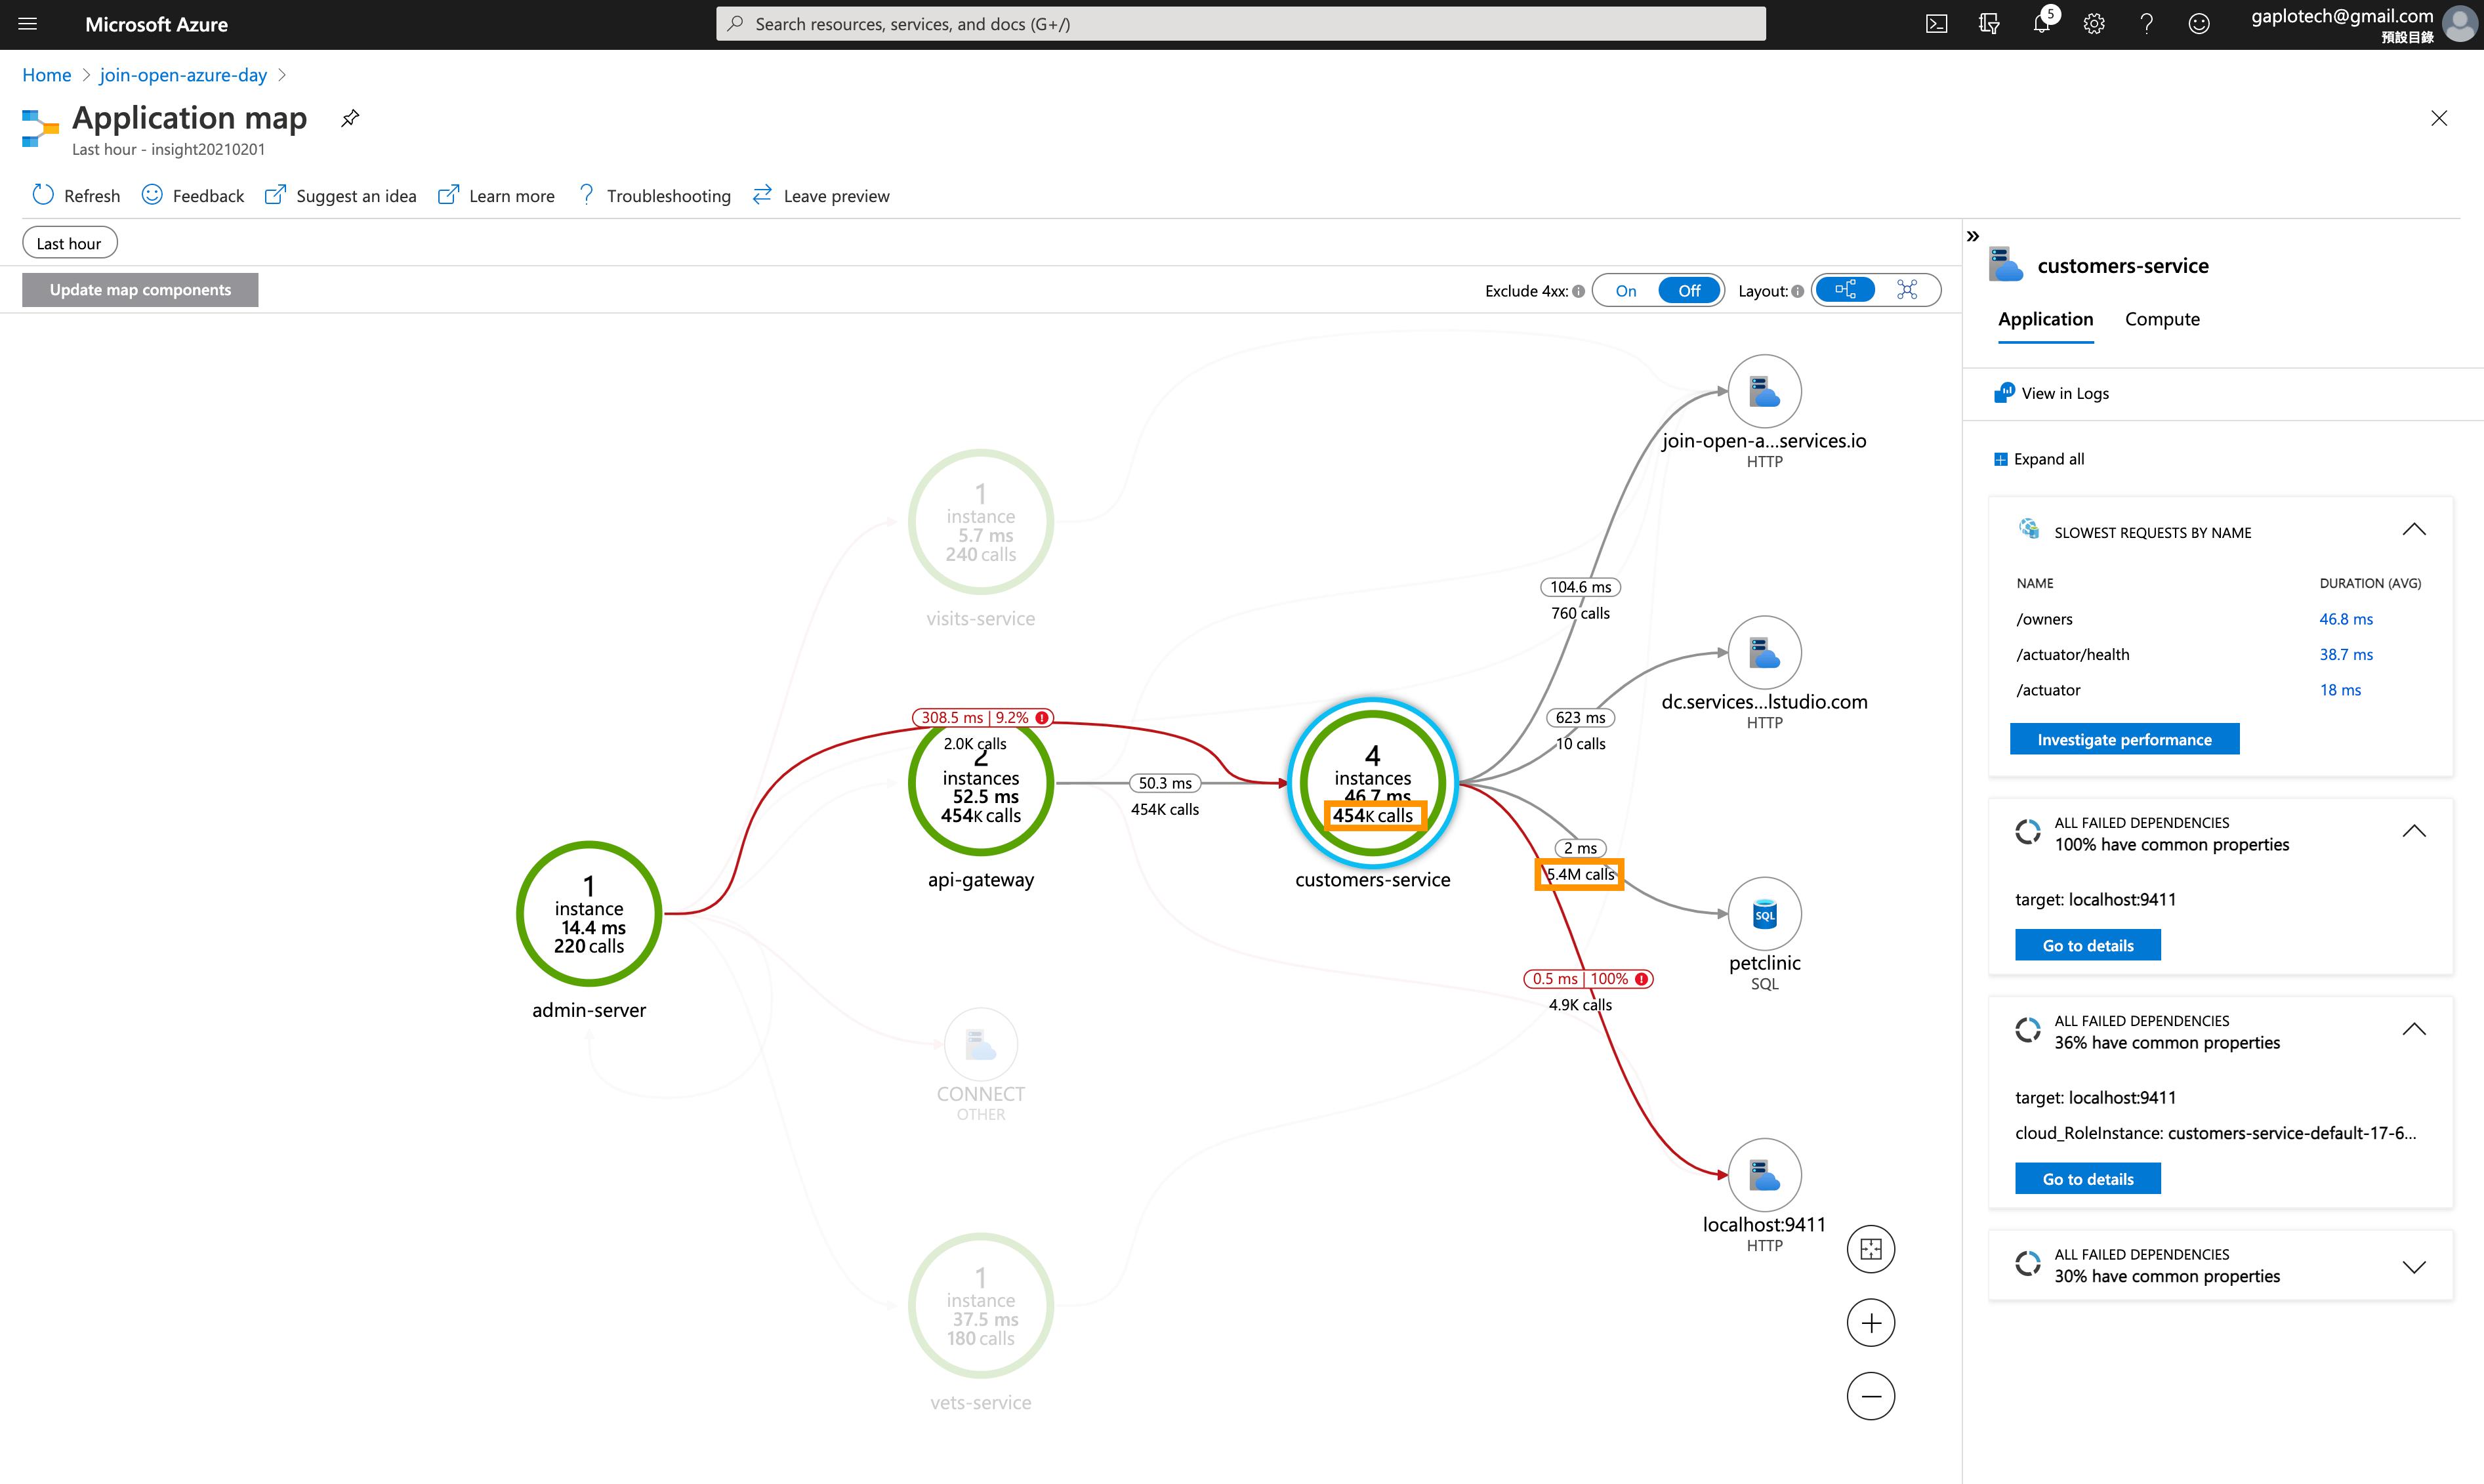 spring-cloud-application-map-highlight-1